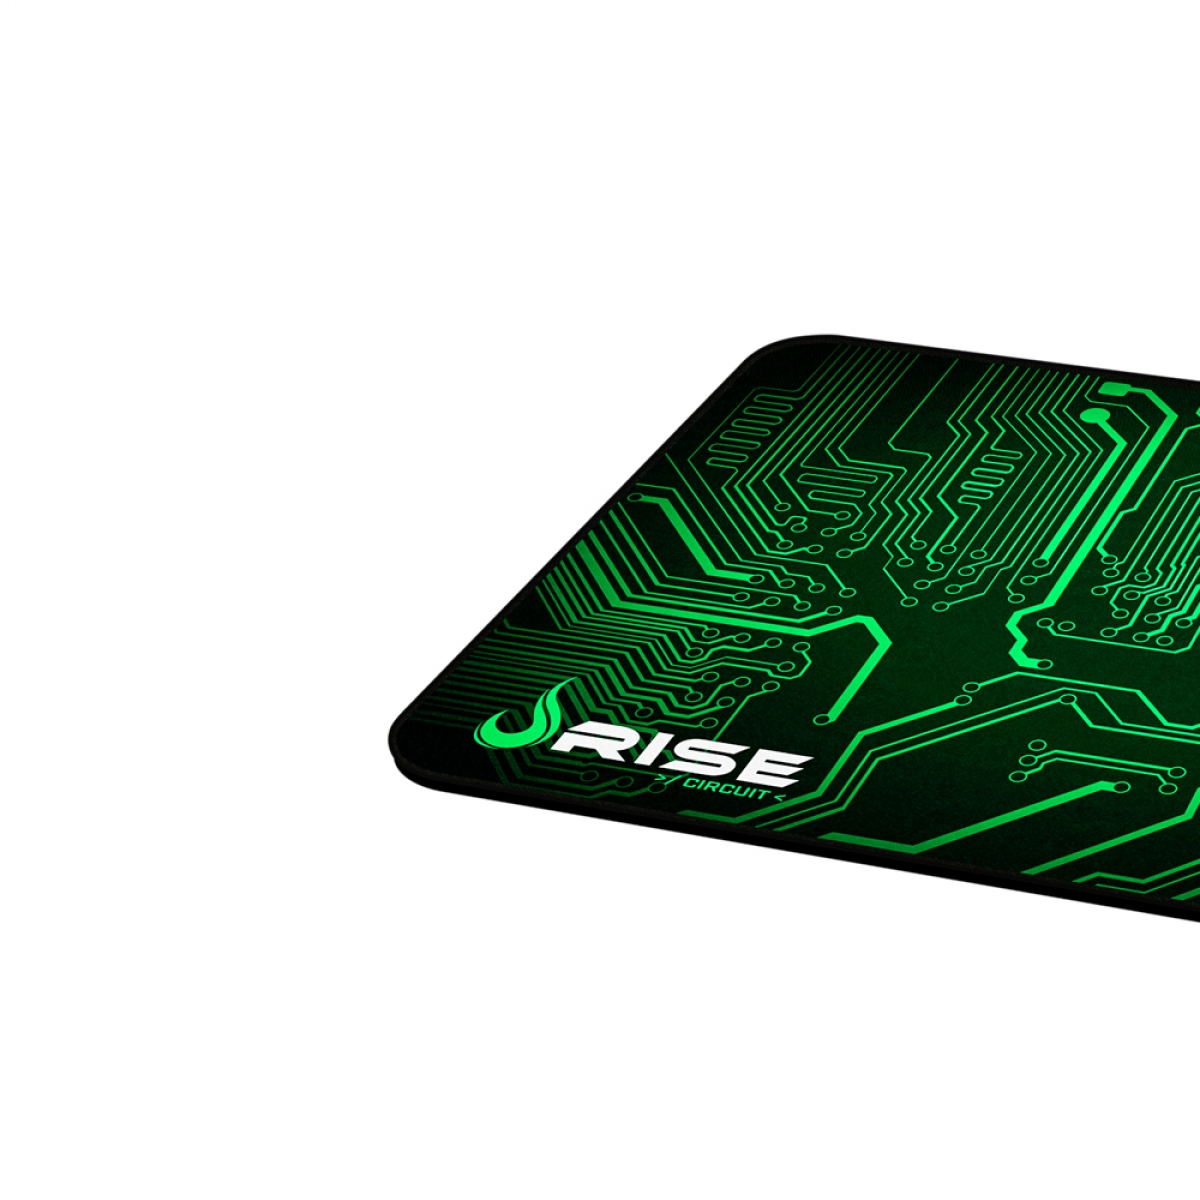 Mouse Pad GAMING CIRCUIT RG-MP-04-CRT Médio Borda Costurada